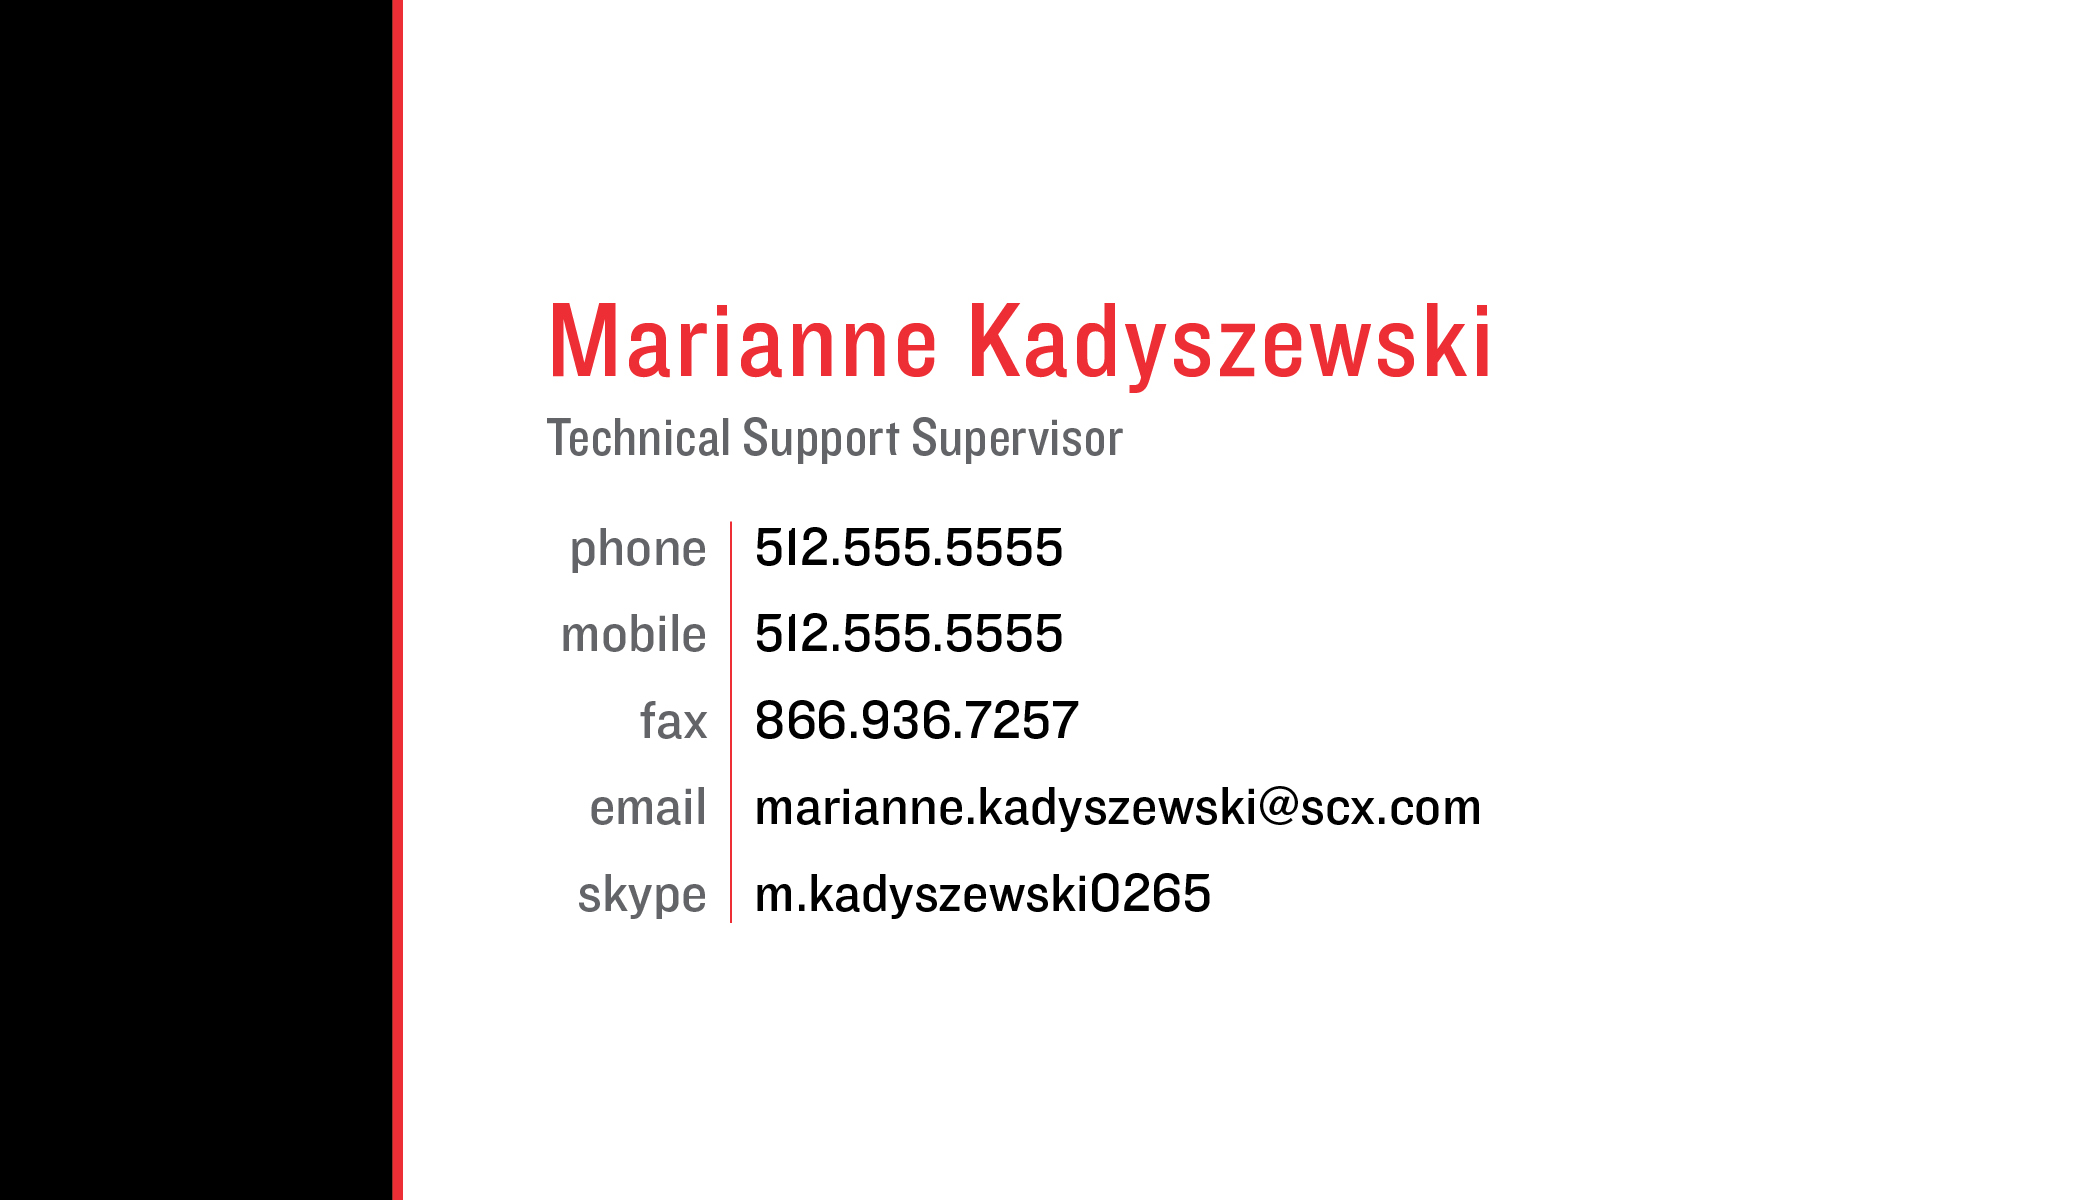 SC business card design concepts11.jpg